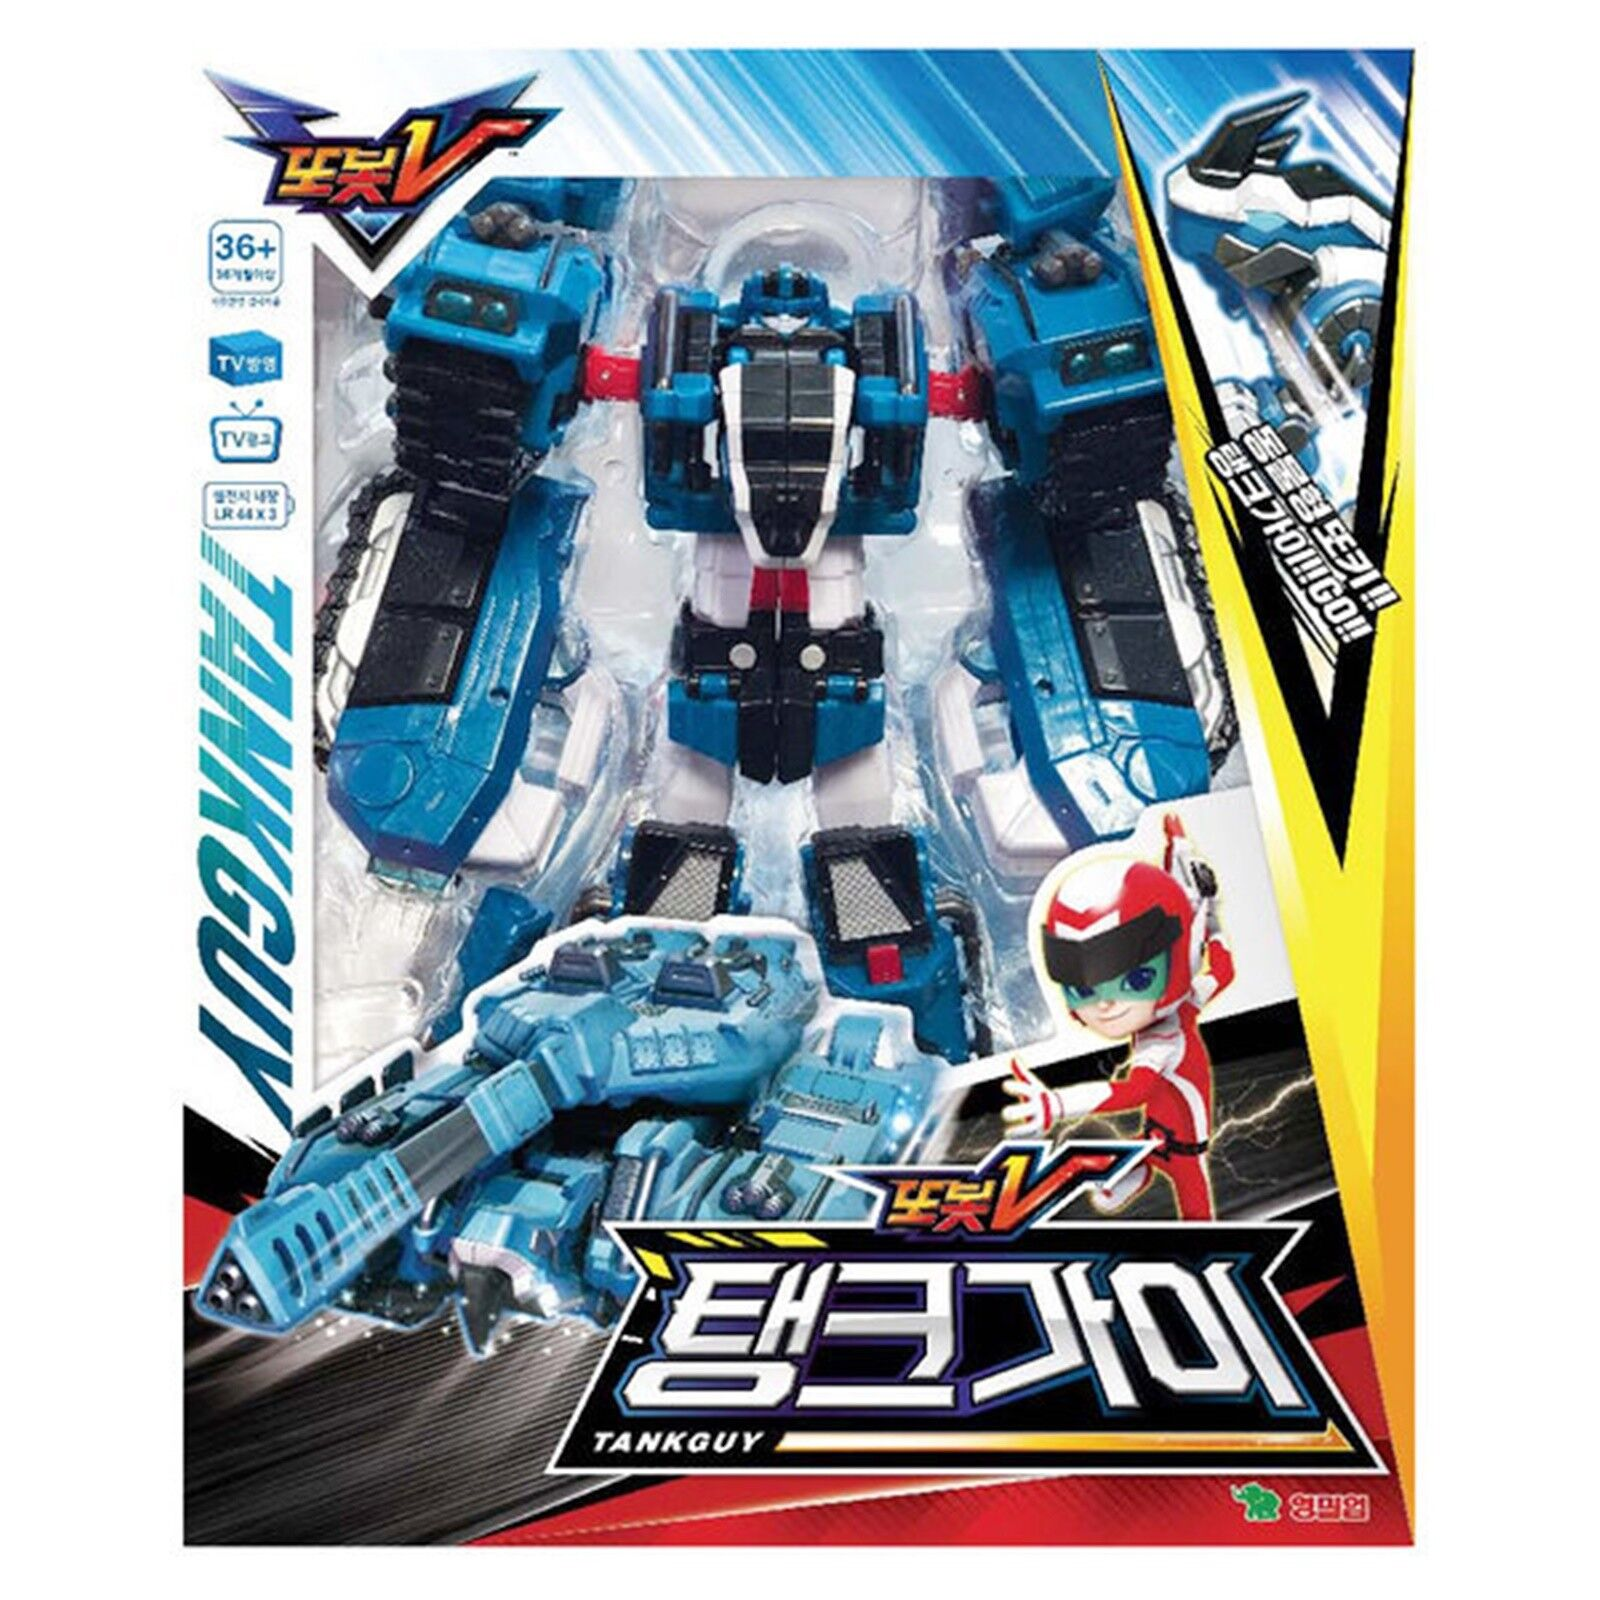 TOBOT V   TANK TANK TANK GUY & GREAT ADMIRAL  Integration Copolymer Transformer Robot Toys f75488